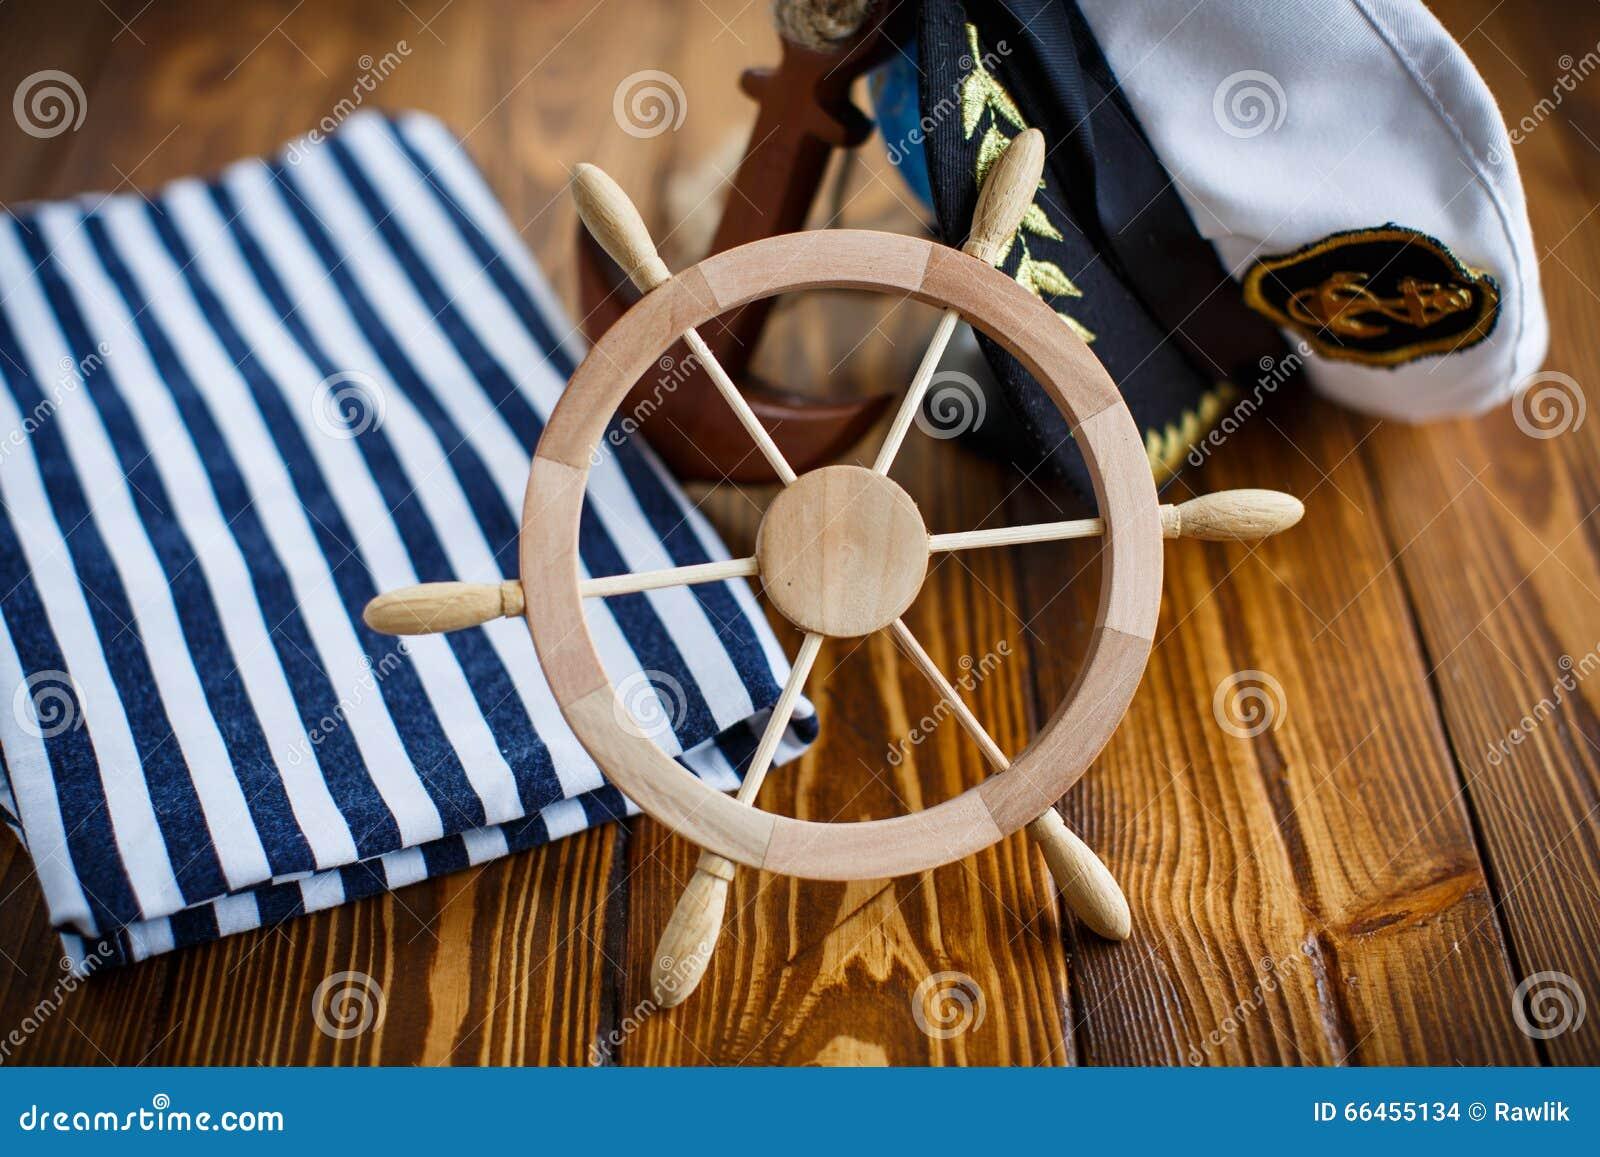 Decorative Wooden Steering Wheel Stock Photo Image Of Helm Brown 66455134